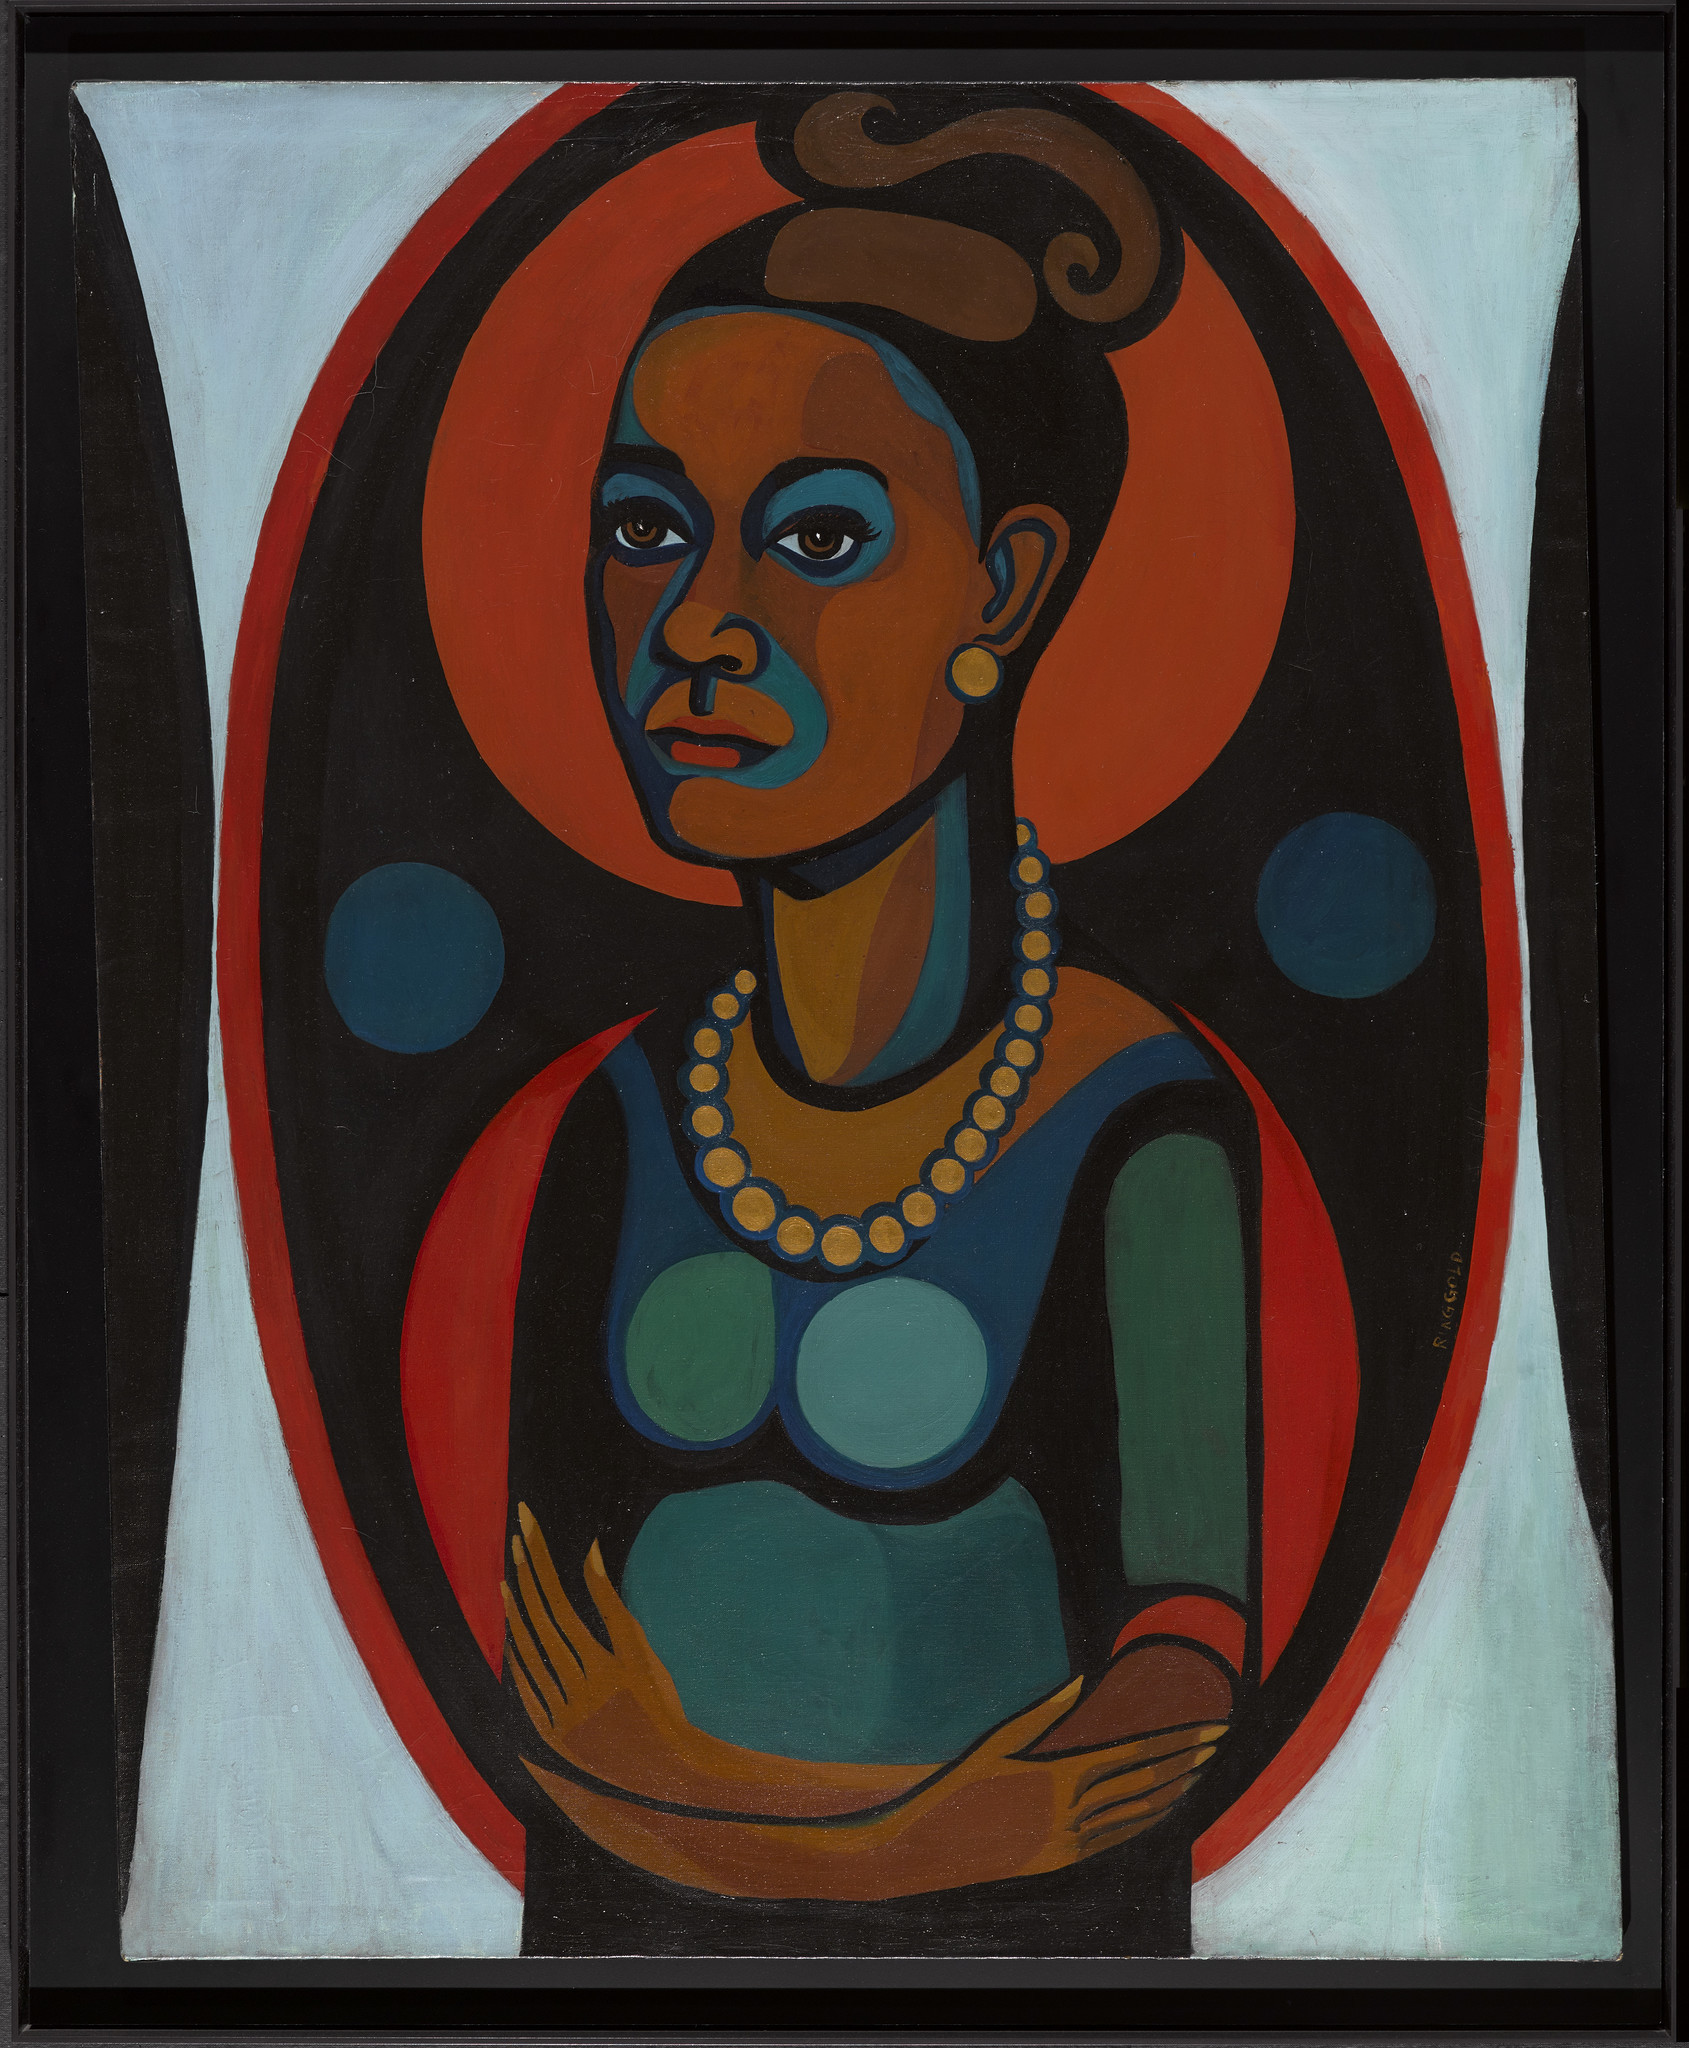 African American Art, African American Artists, Black Art, Black Artists, African American Female Artists, Michele Wallace, Faith Ringgold, Jae Jarrell, Lorraine O'Grady, Maren Hassinger, Betye Saa, KOLUMN Magazine, KOLUMN